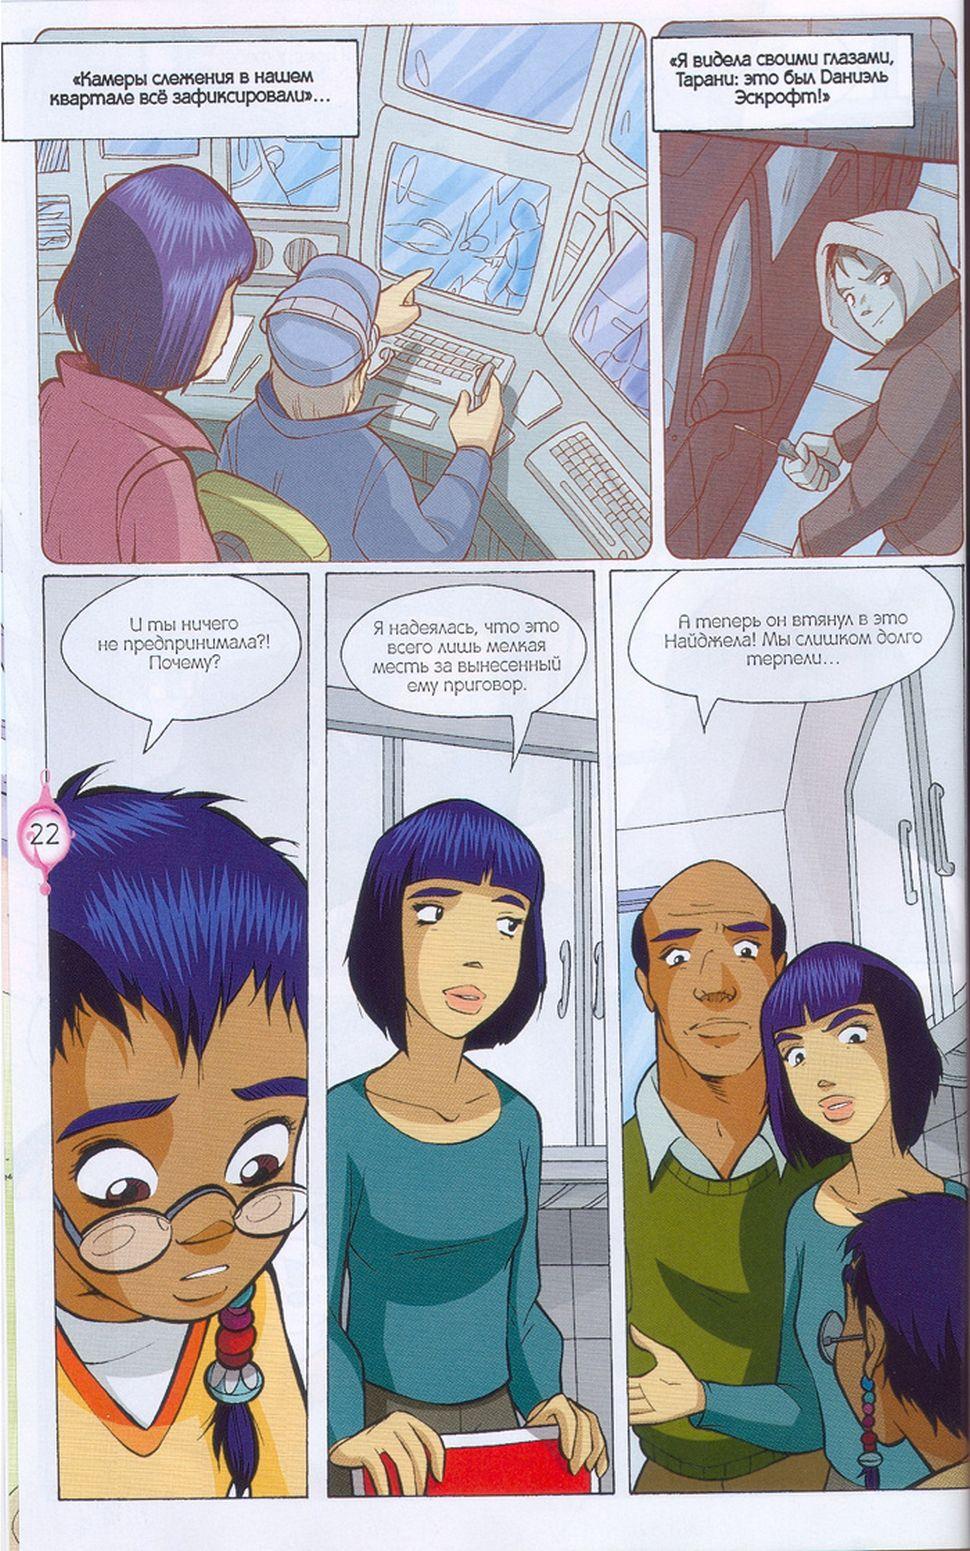 WITСH.Чародейки - Бунтующие души. 3 сезон 36 серия